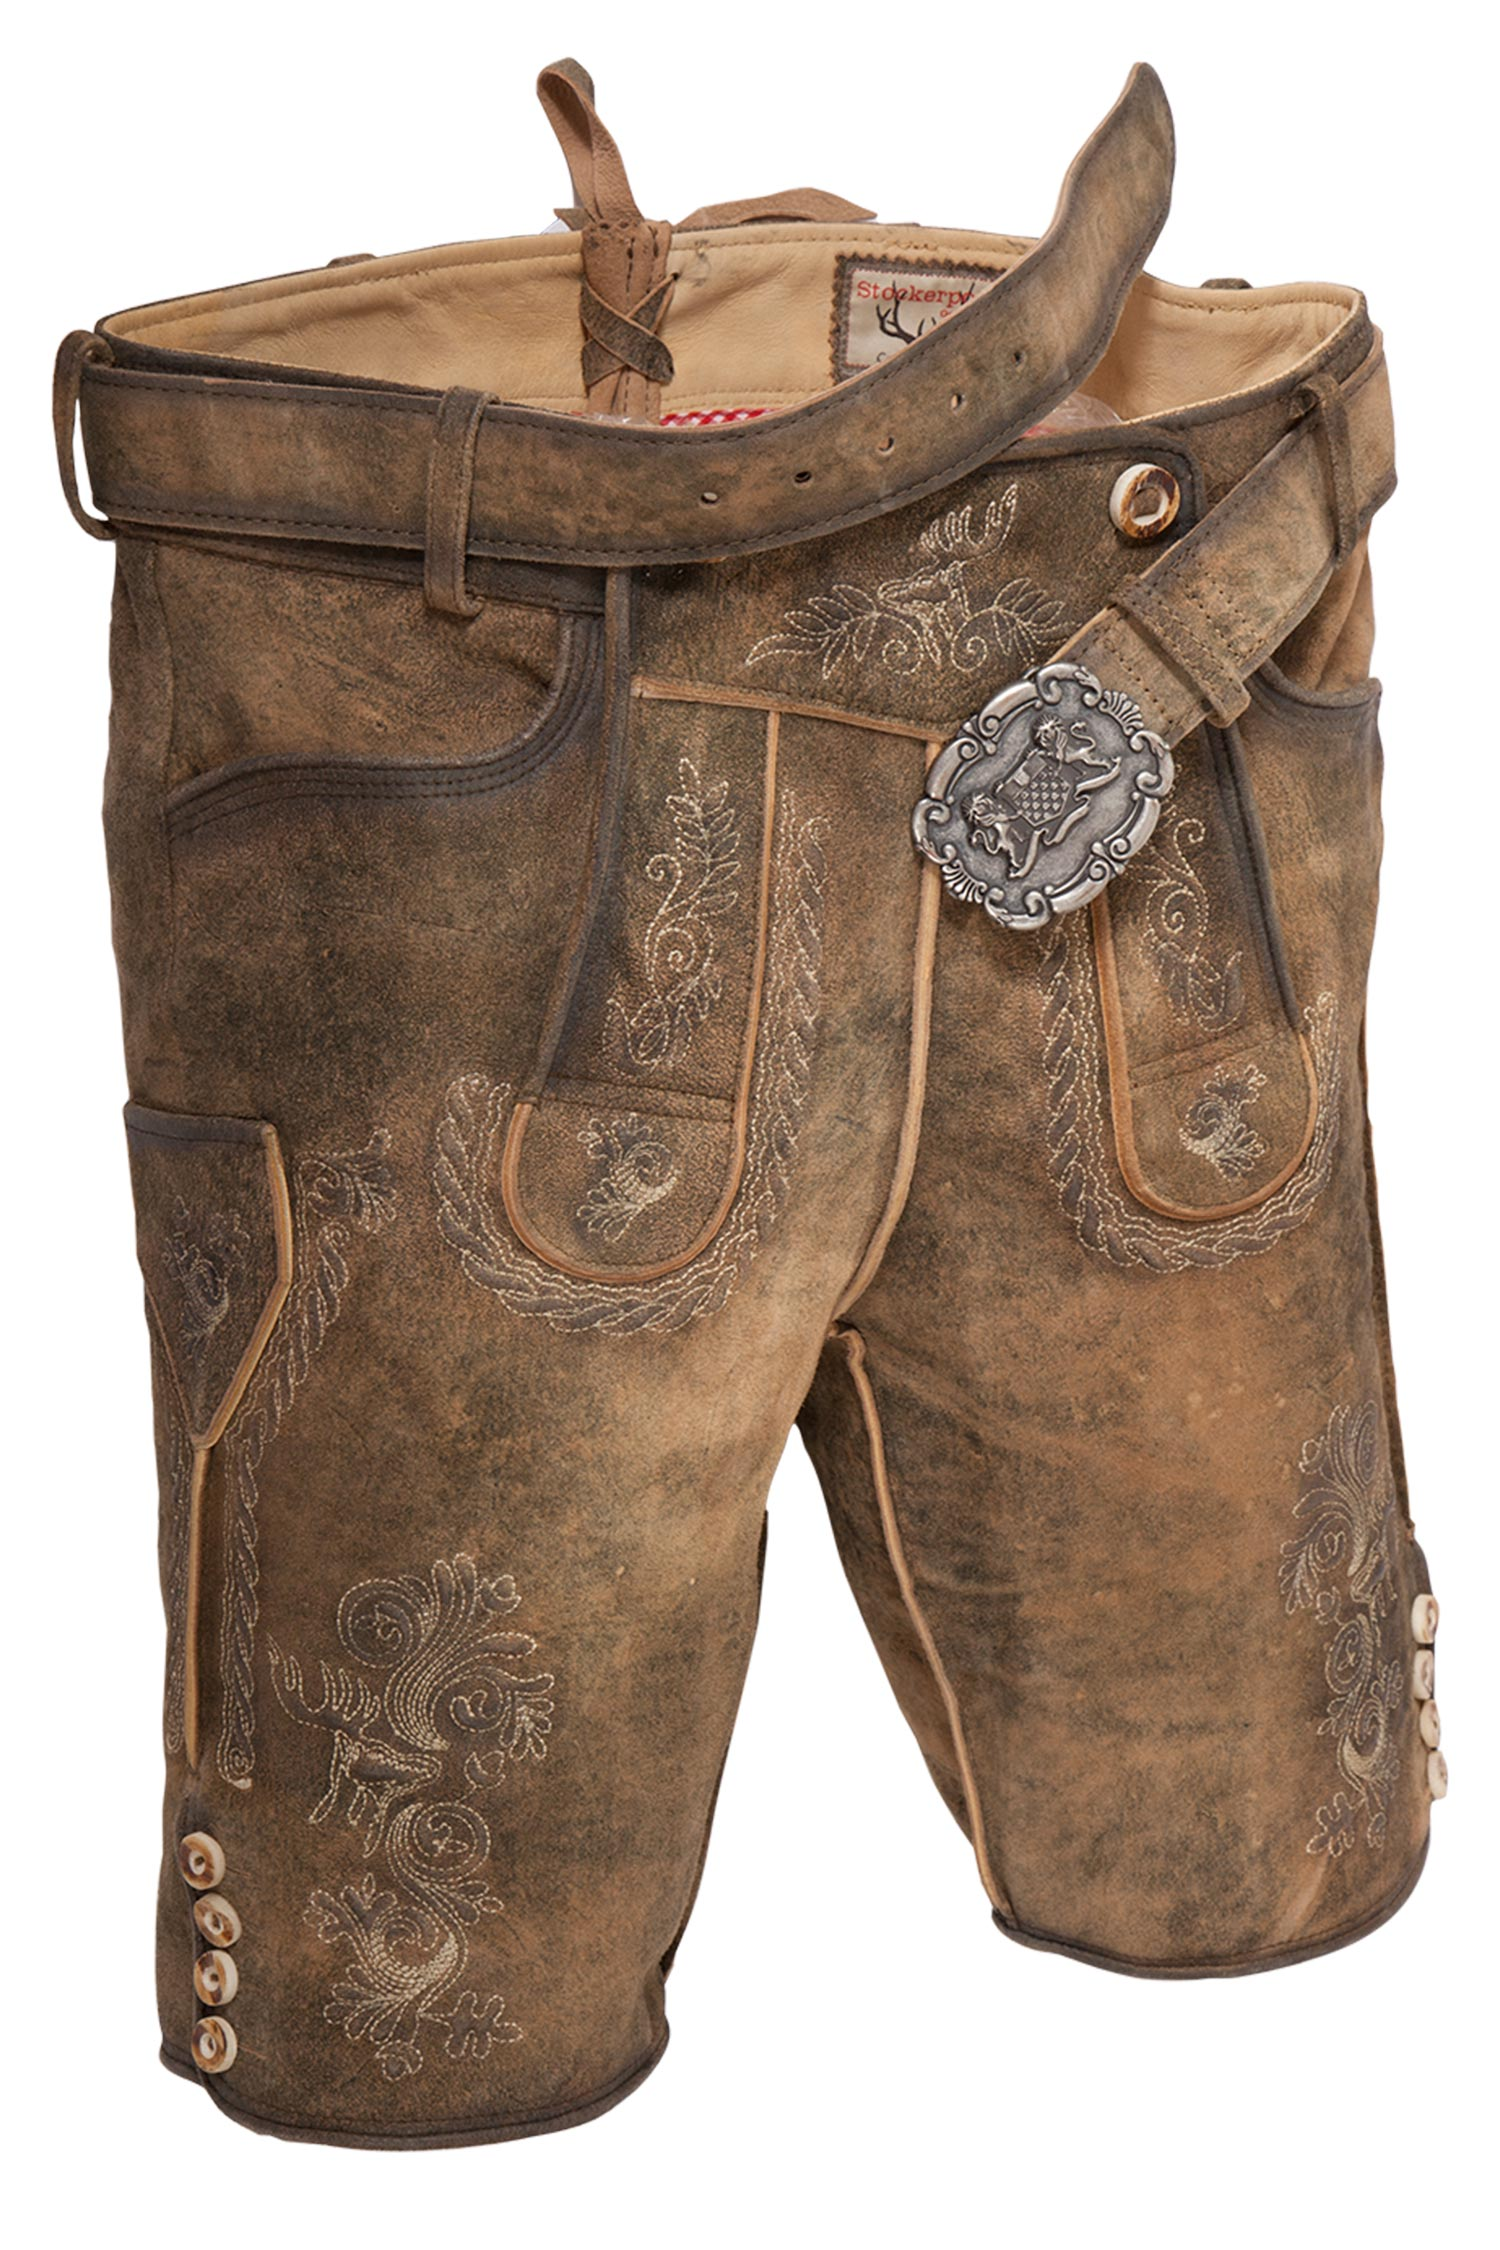 Lederhose kurz in korn gespeckt Wildbock Leder braun used   Wirkes c61798100b